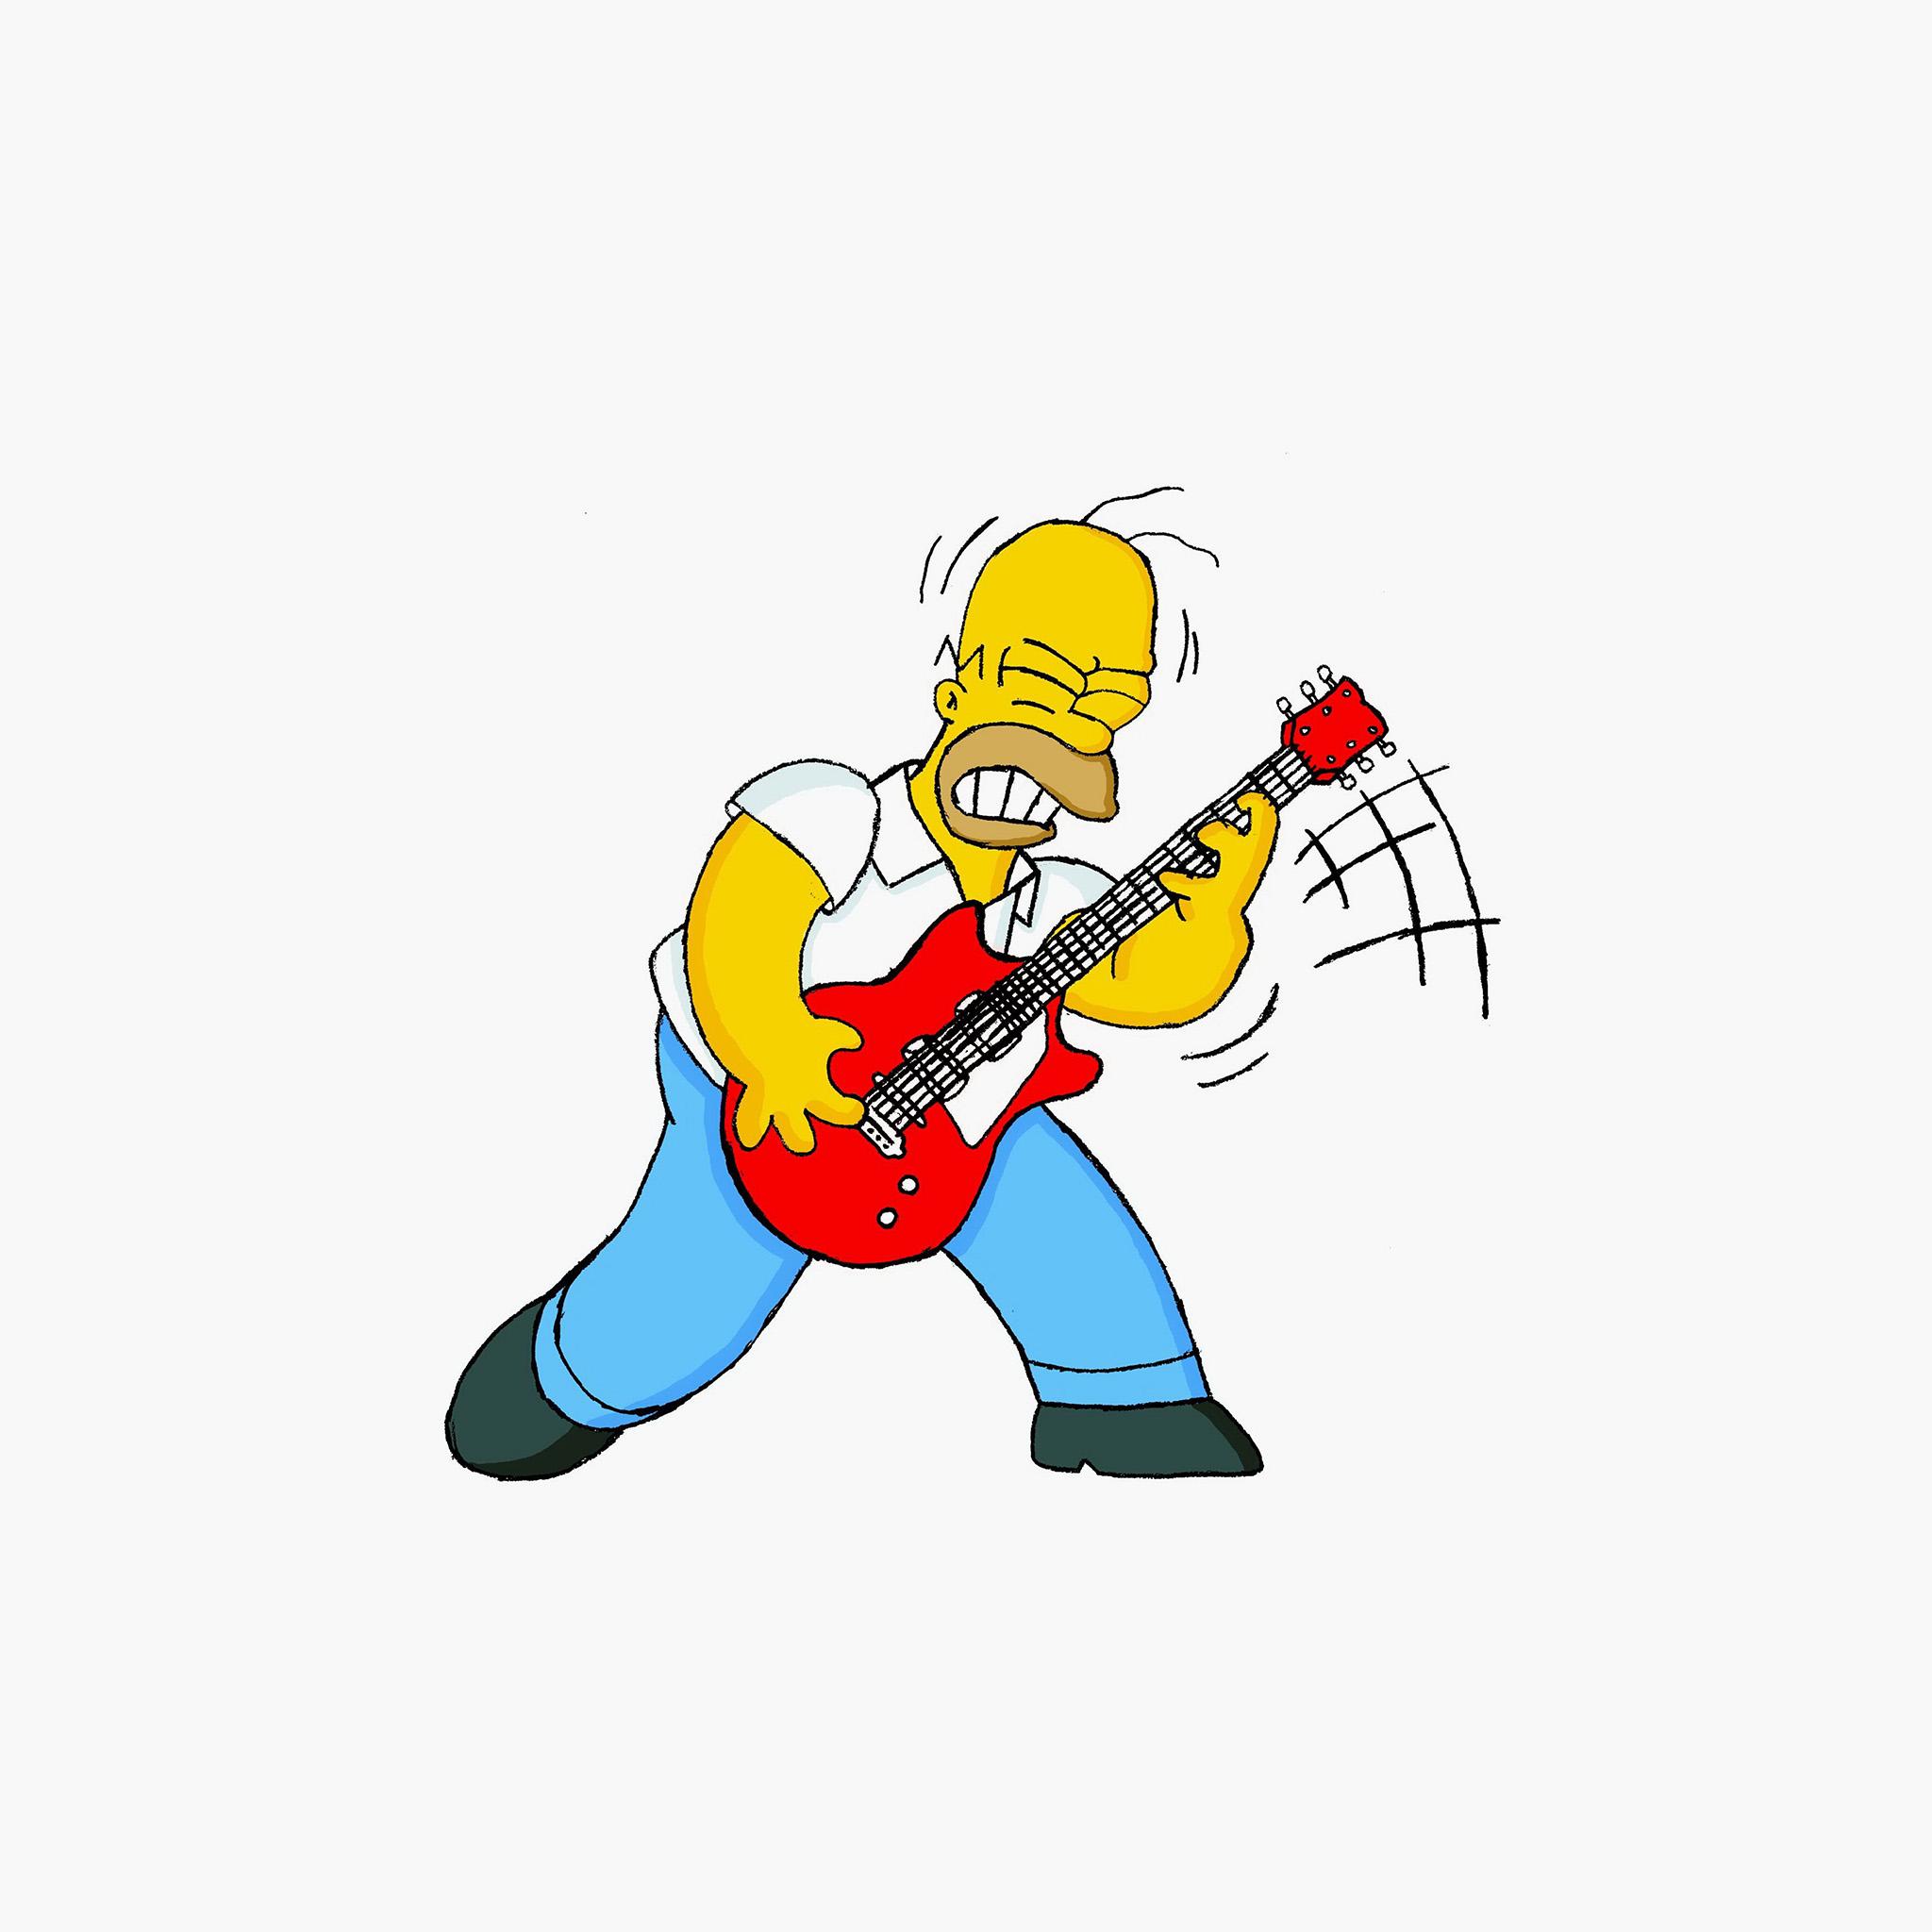 Au45 homer simpson guitar cartoon illustration art wallpaper - Guitare simpson ...